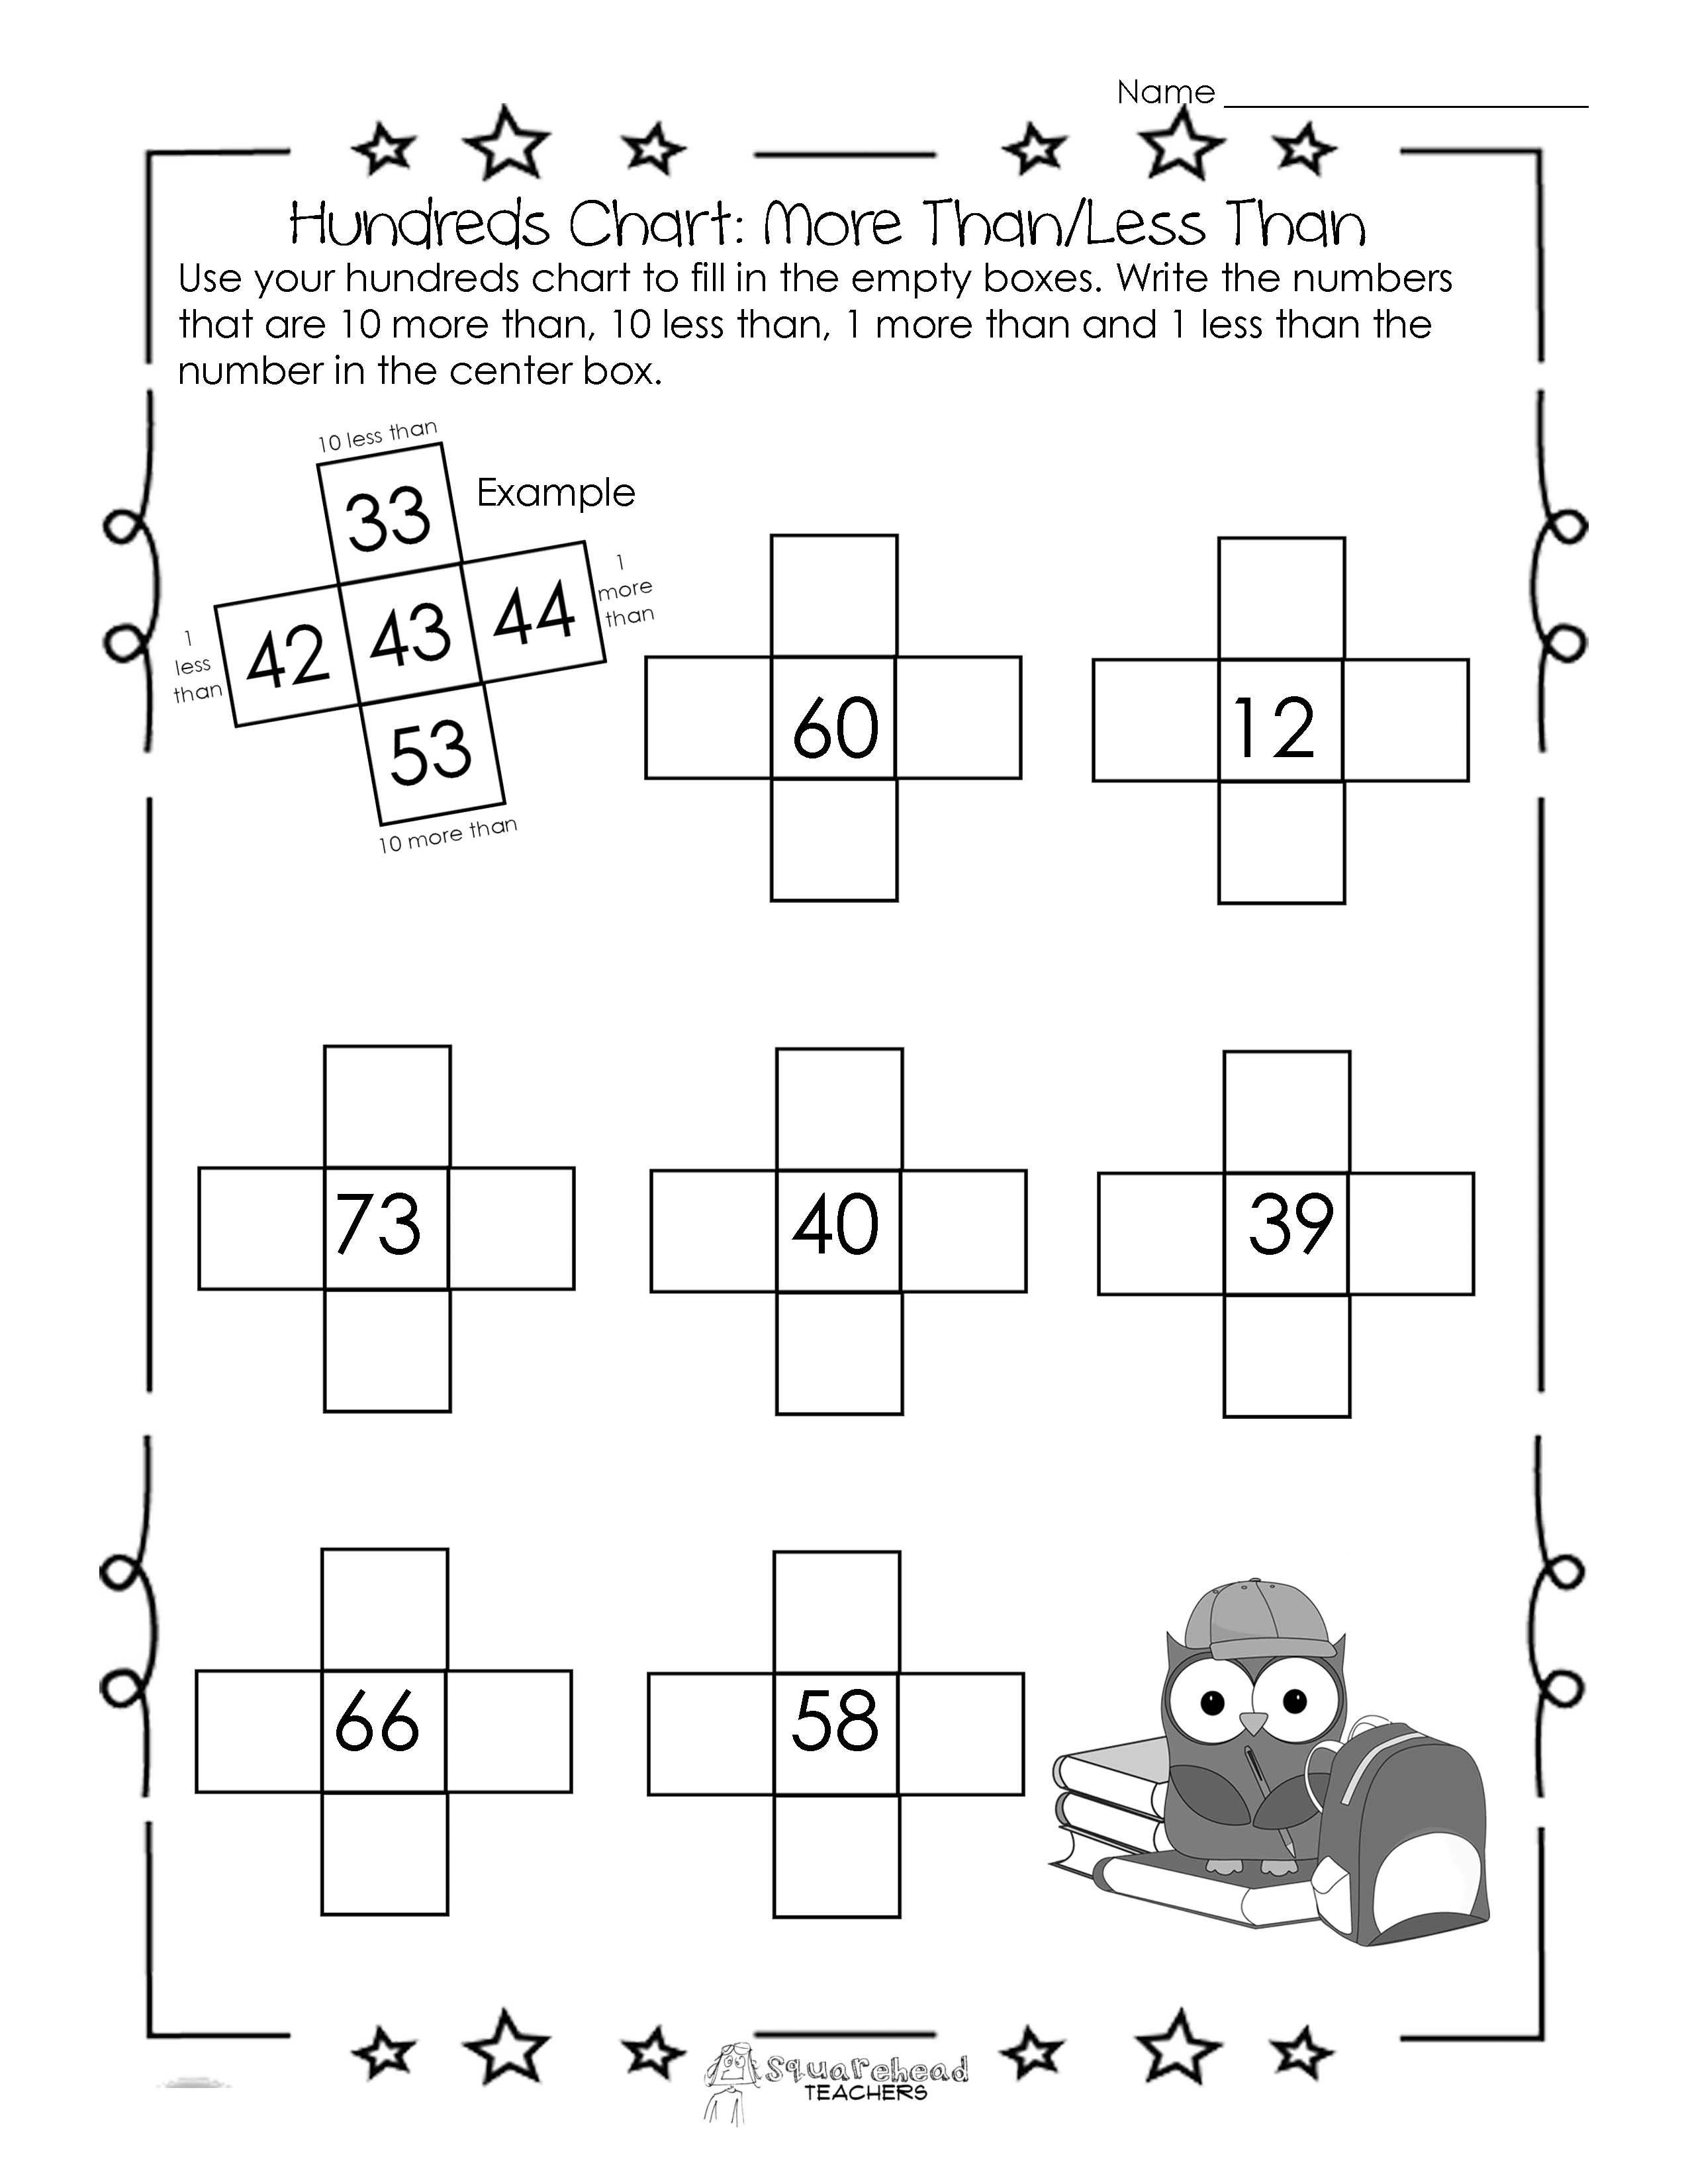 Hundreds Chart Worksheet 10 More Than10 Less Than  Squarehead Also Greater Than Less Than Worksheets For Kindergarten